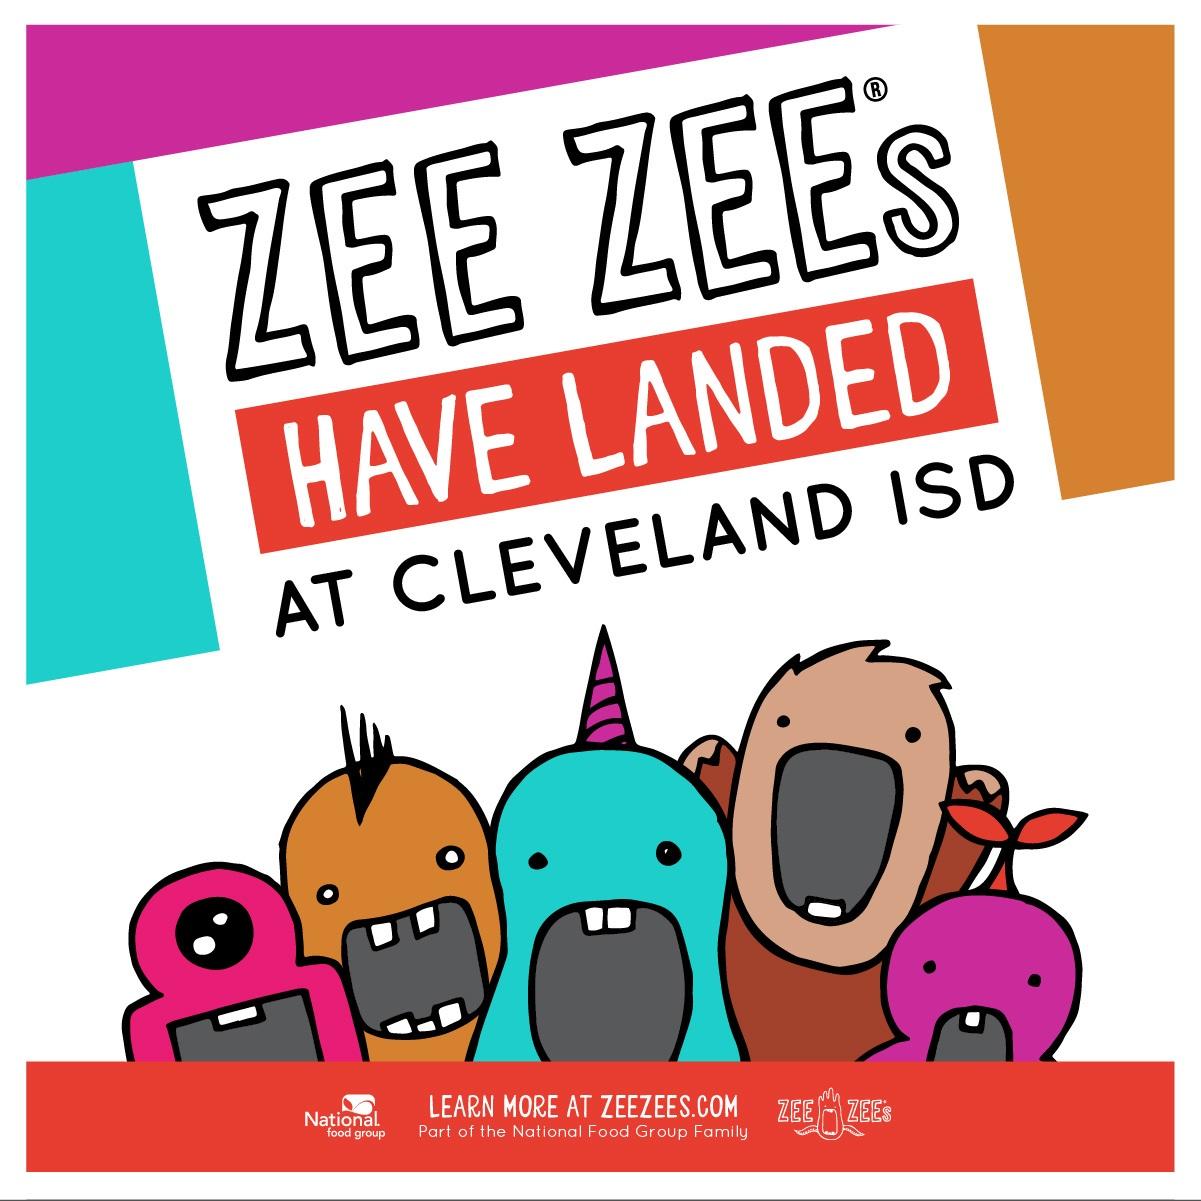 020818_ClevelandWeb_Graphic_1.jpg